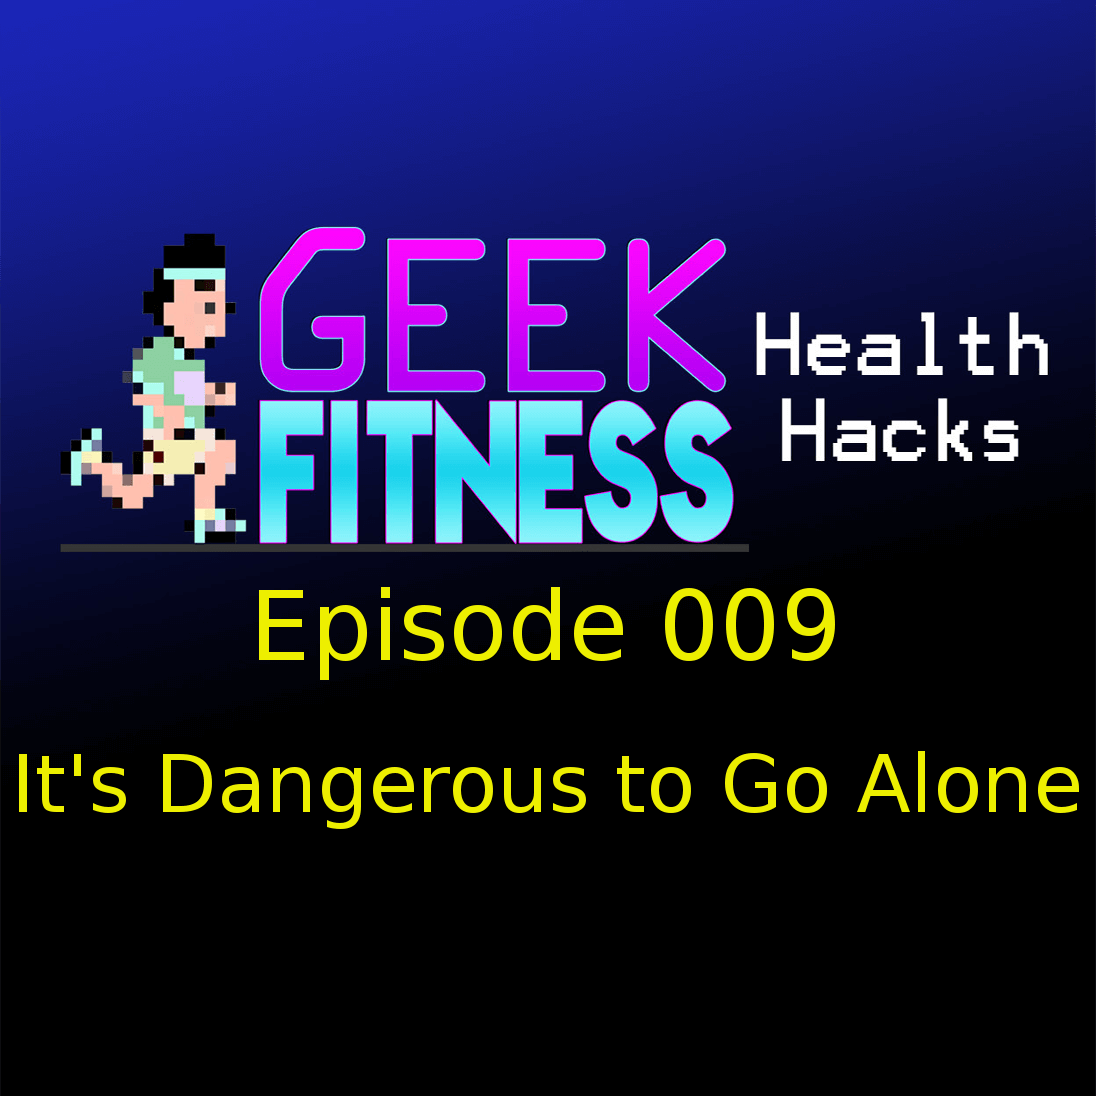 """It's Dangerous to Go Alone"" + Ermagerd Linux Ubuntu! (Geek Fitness Health Hacks, Episode 009)"